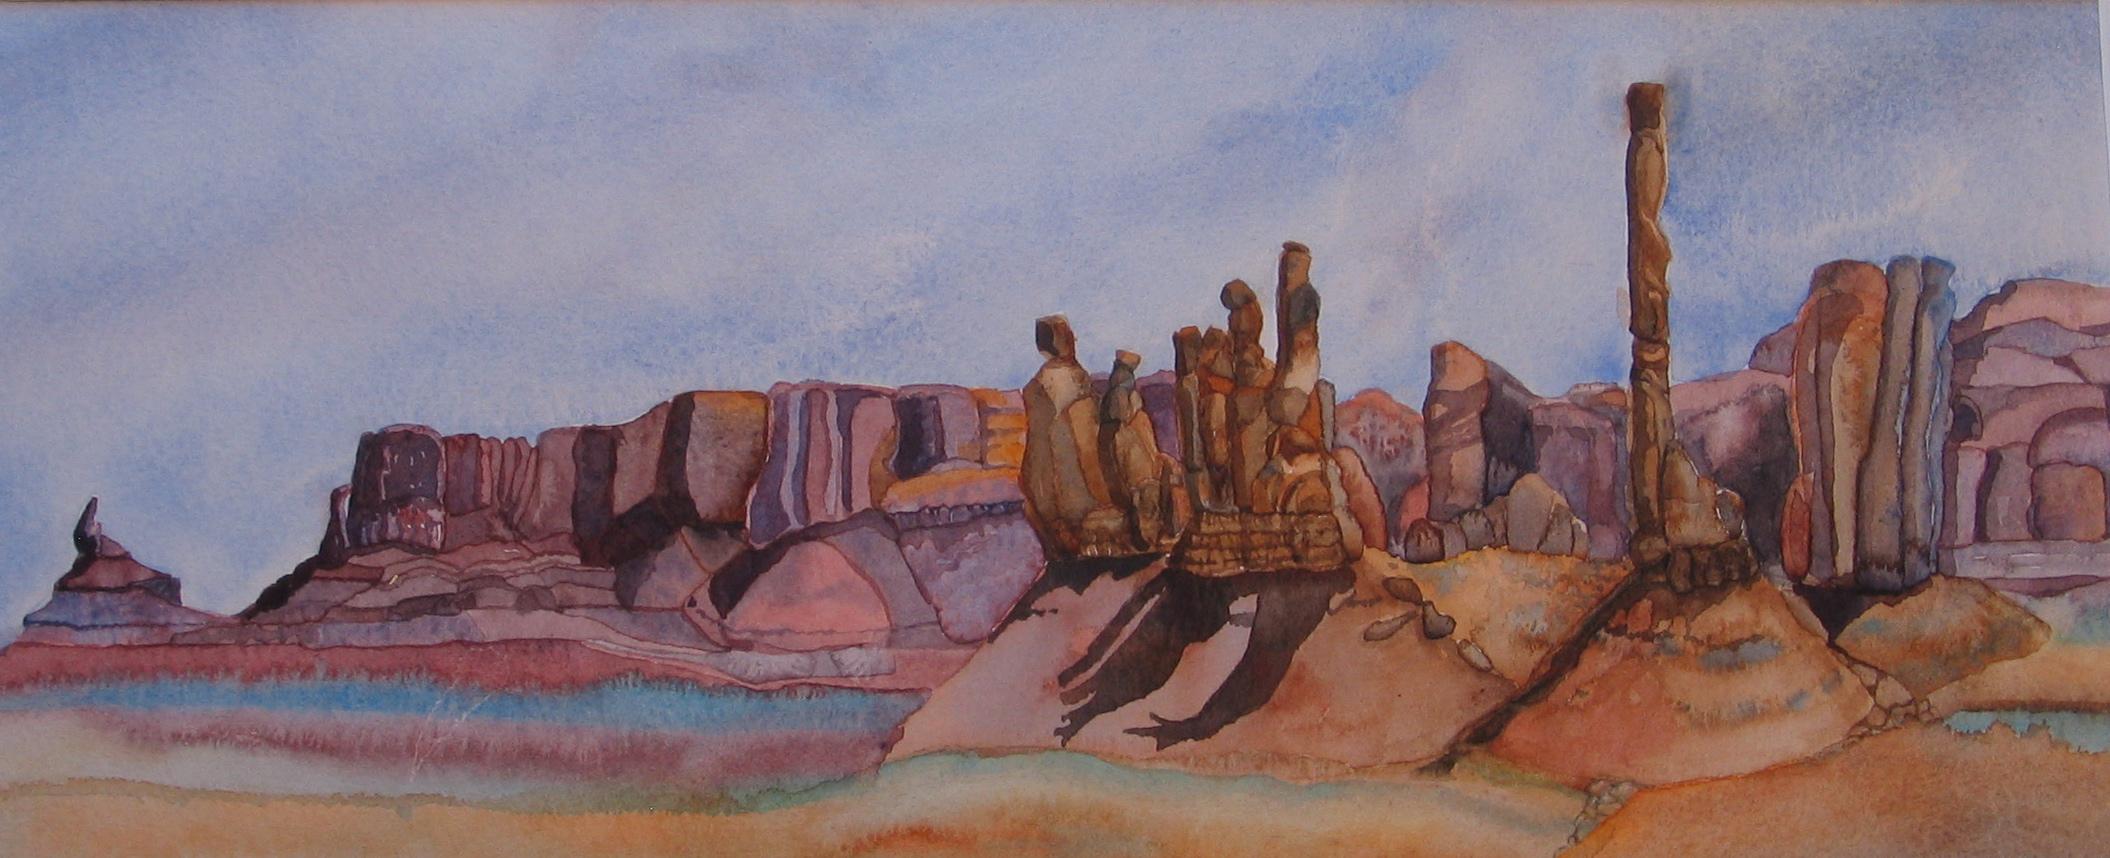 Yei Bi Chei and Totem Pole